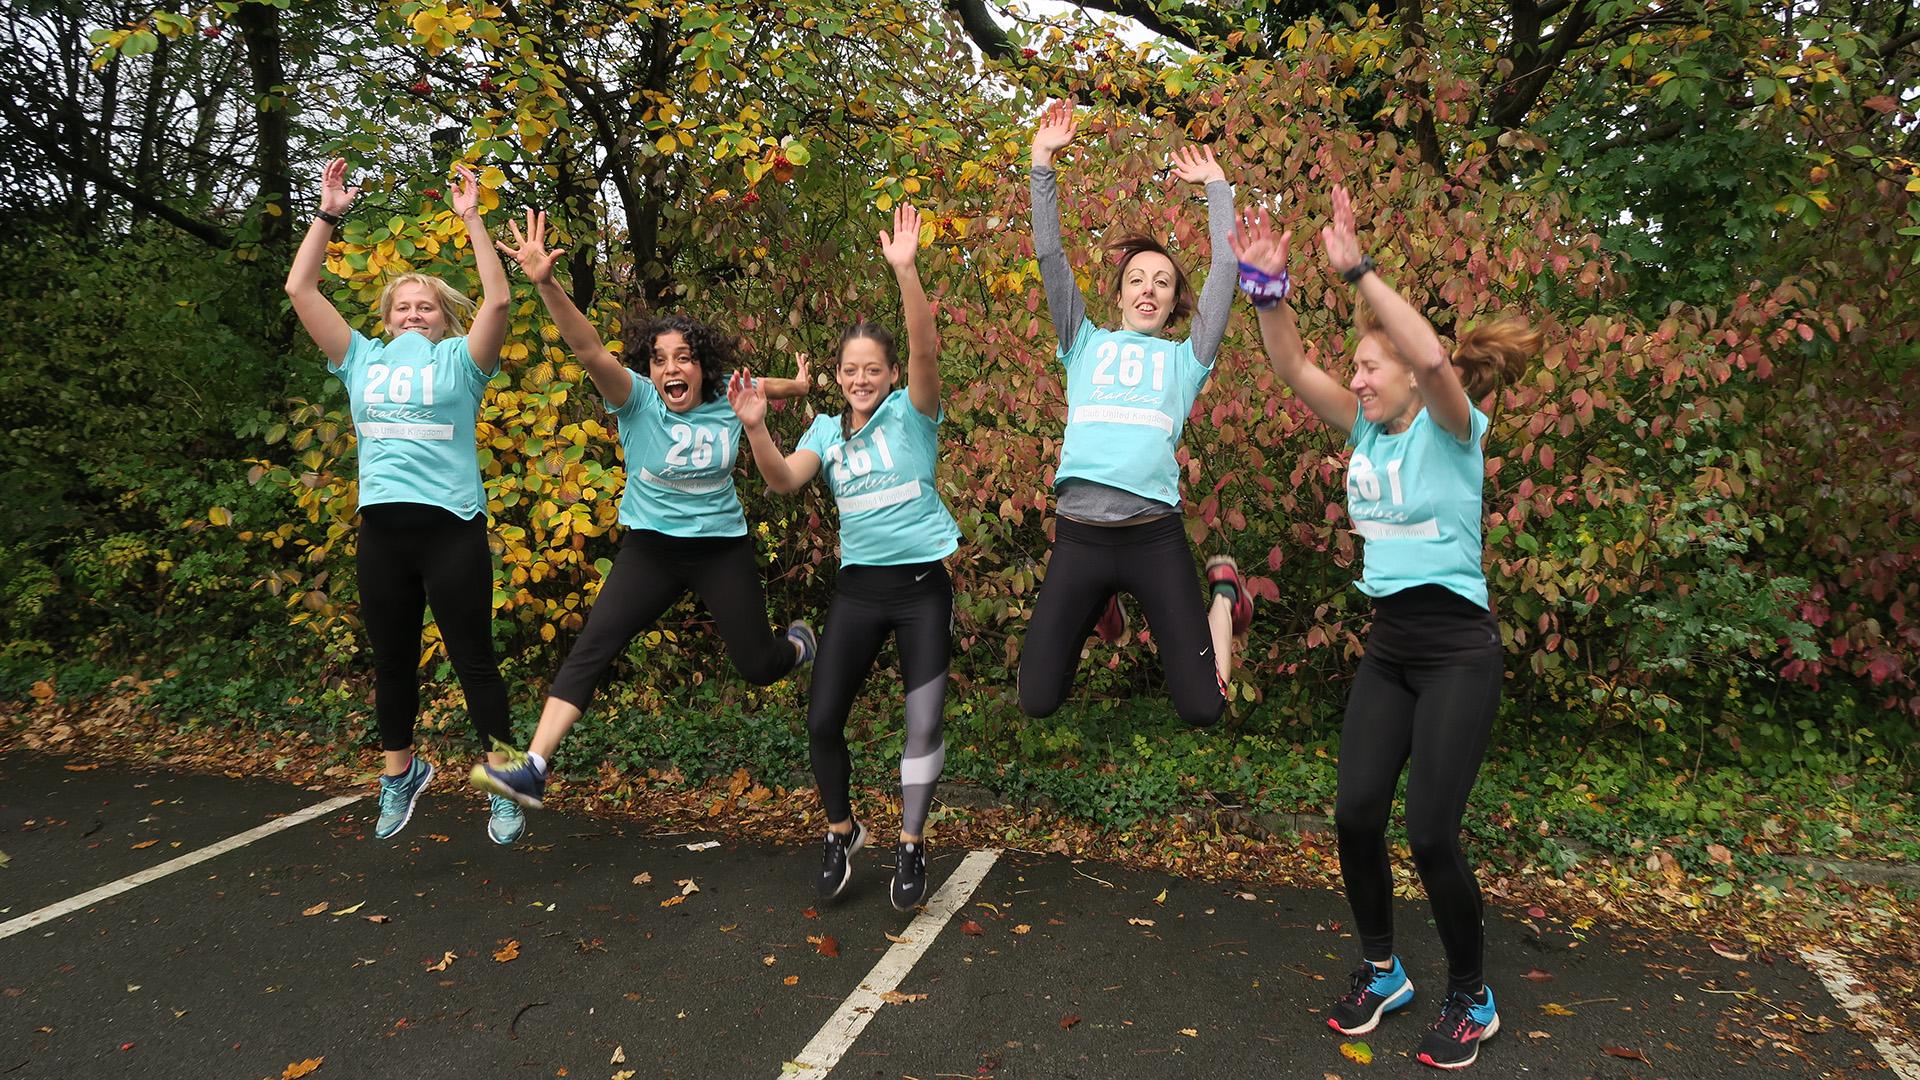 Train the Trainer Fun UK 261 Fearless